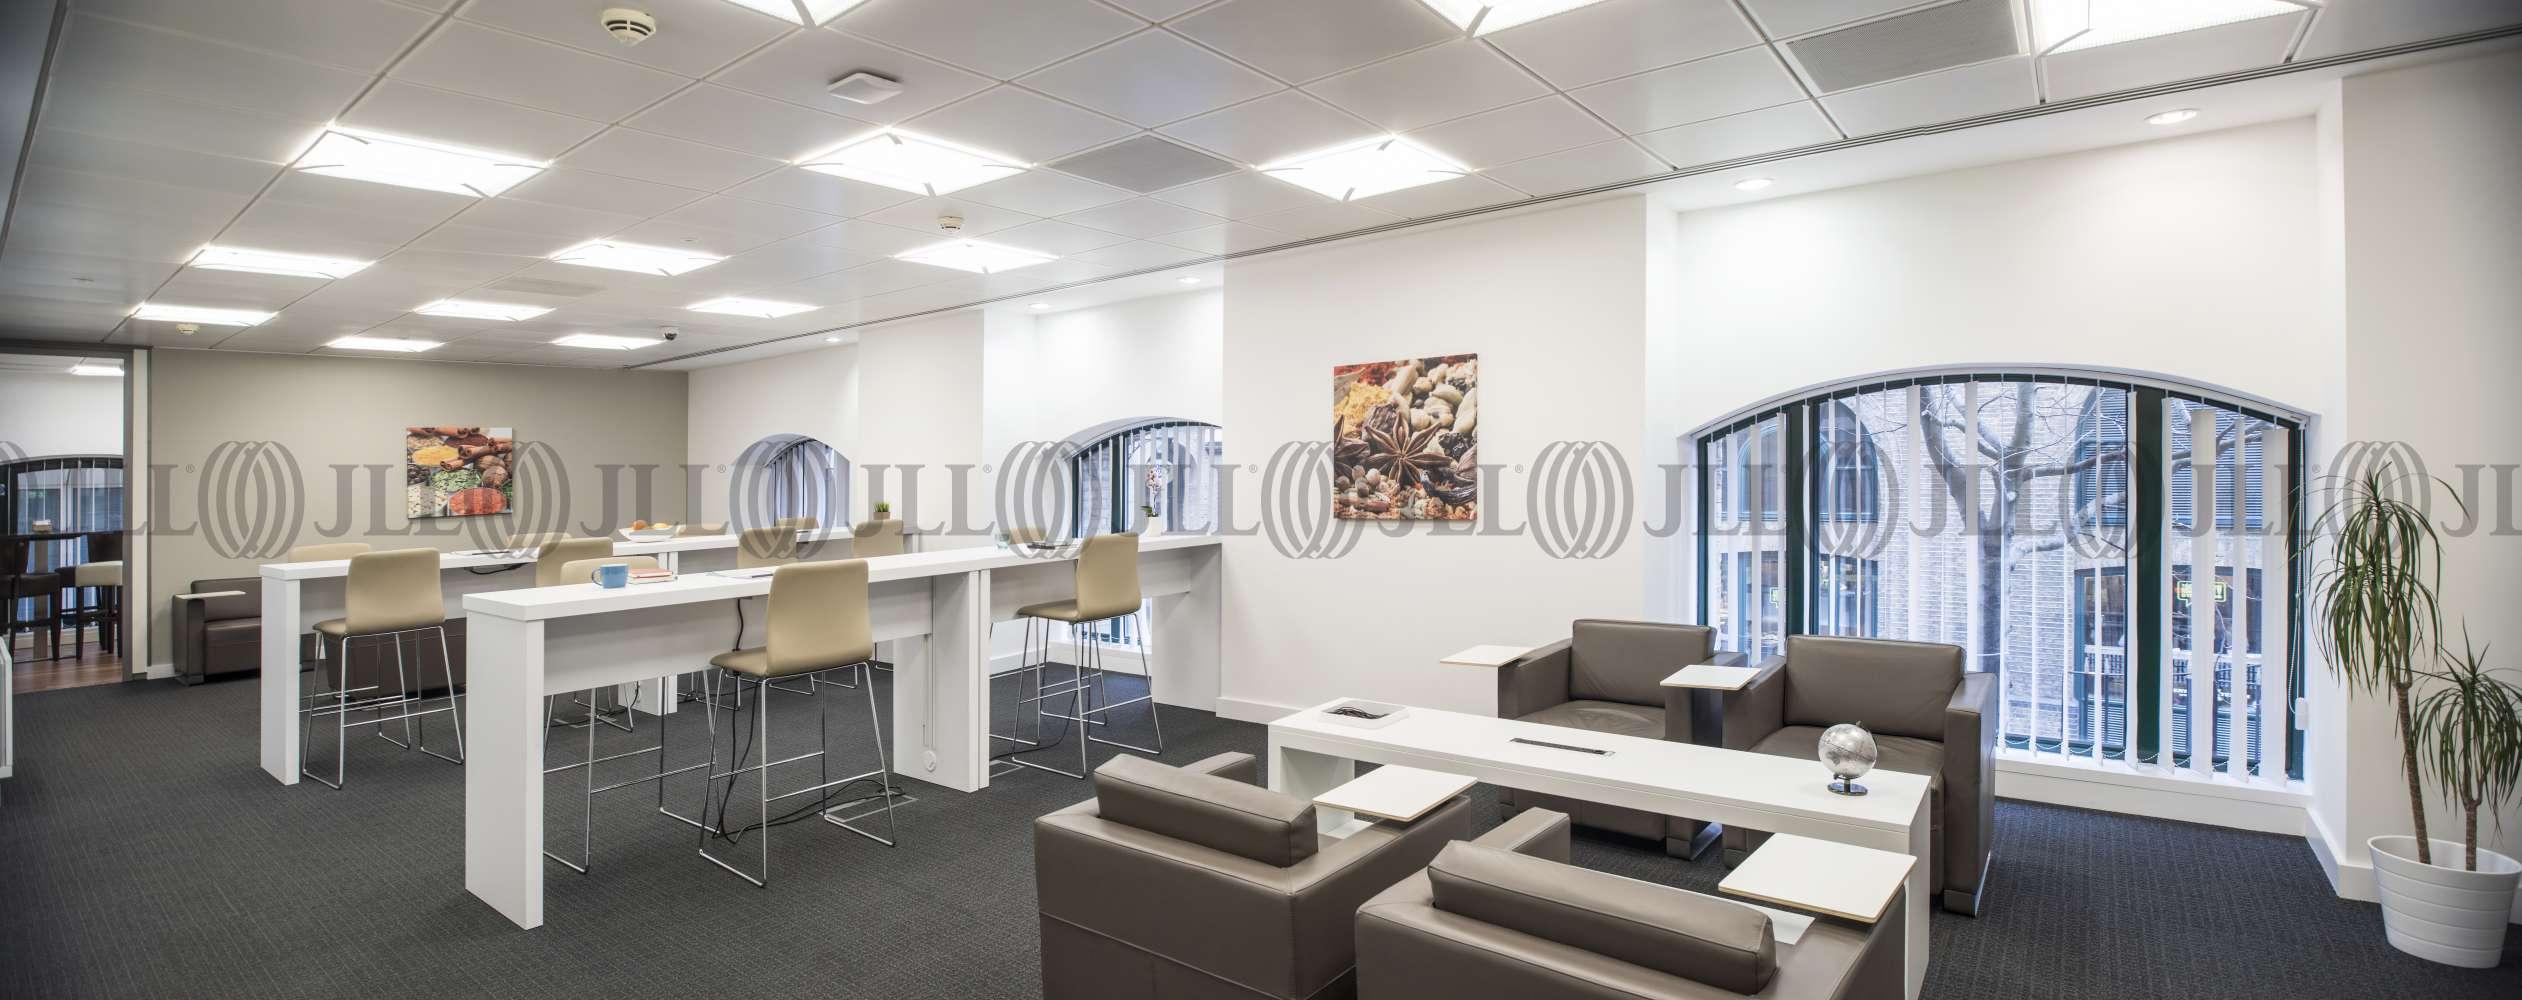 Serviced office London, SE1 2HB - 6 Hays Lane  - 010